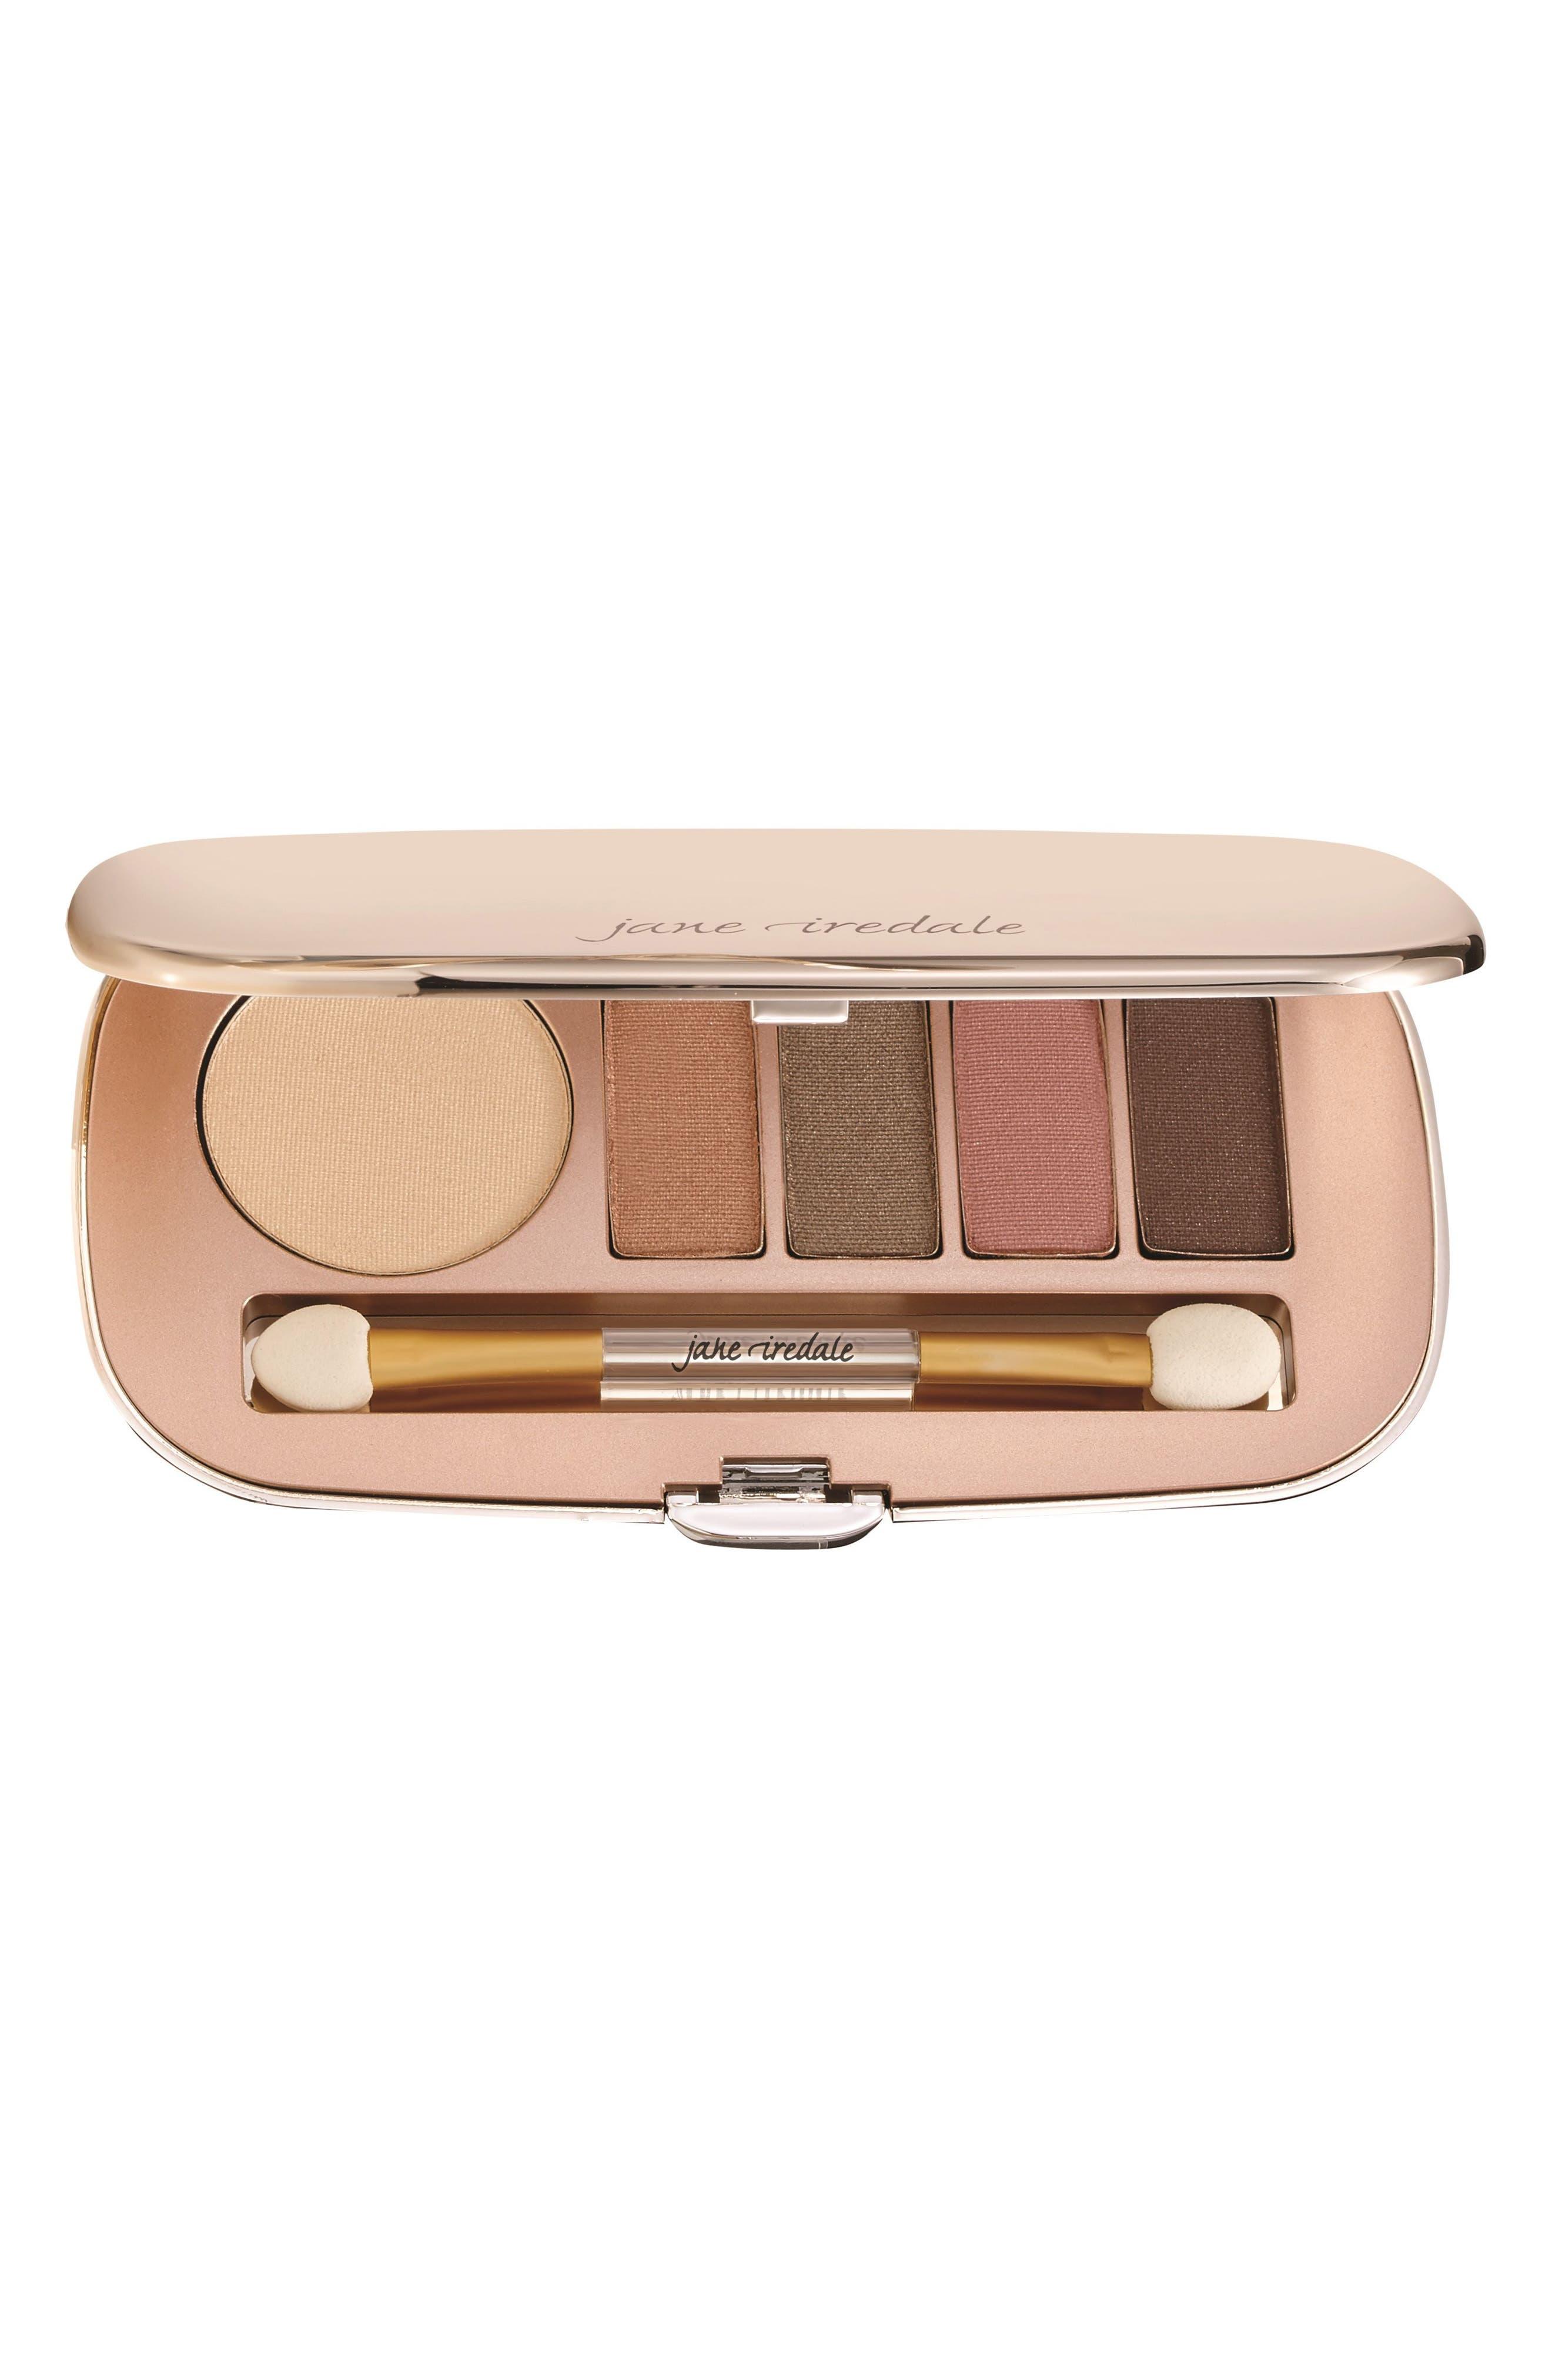 Naturally Glam Eyeshadow Kit,                         Main,                         color, NO COLOR